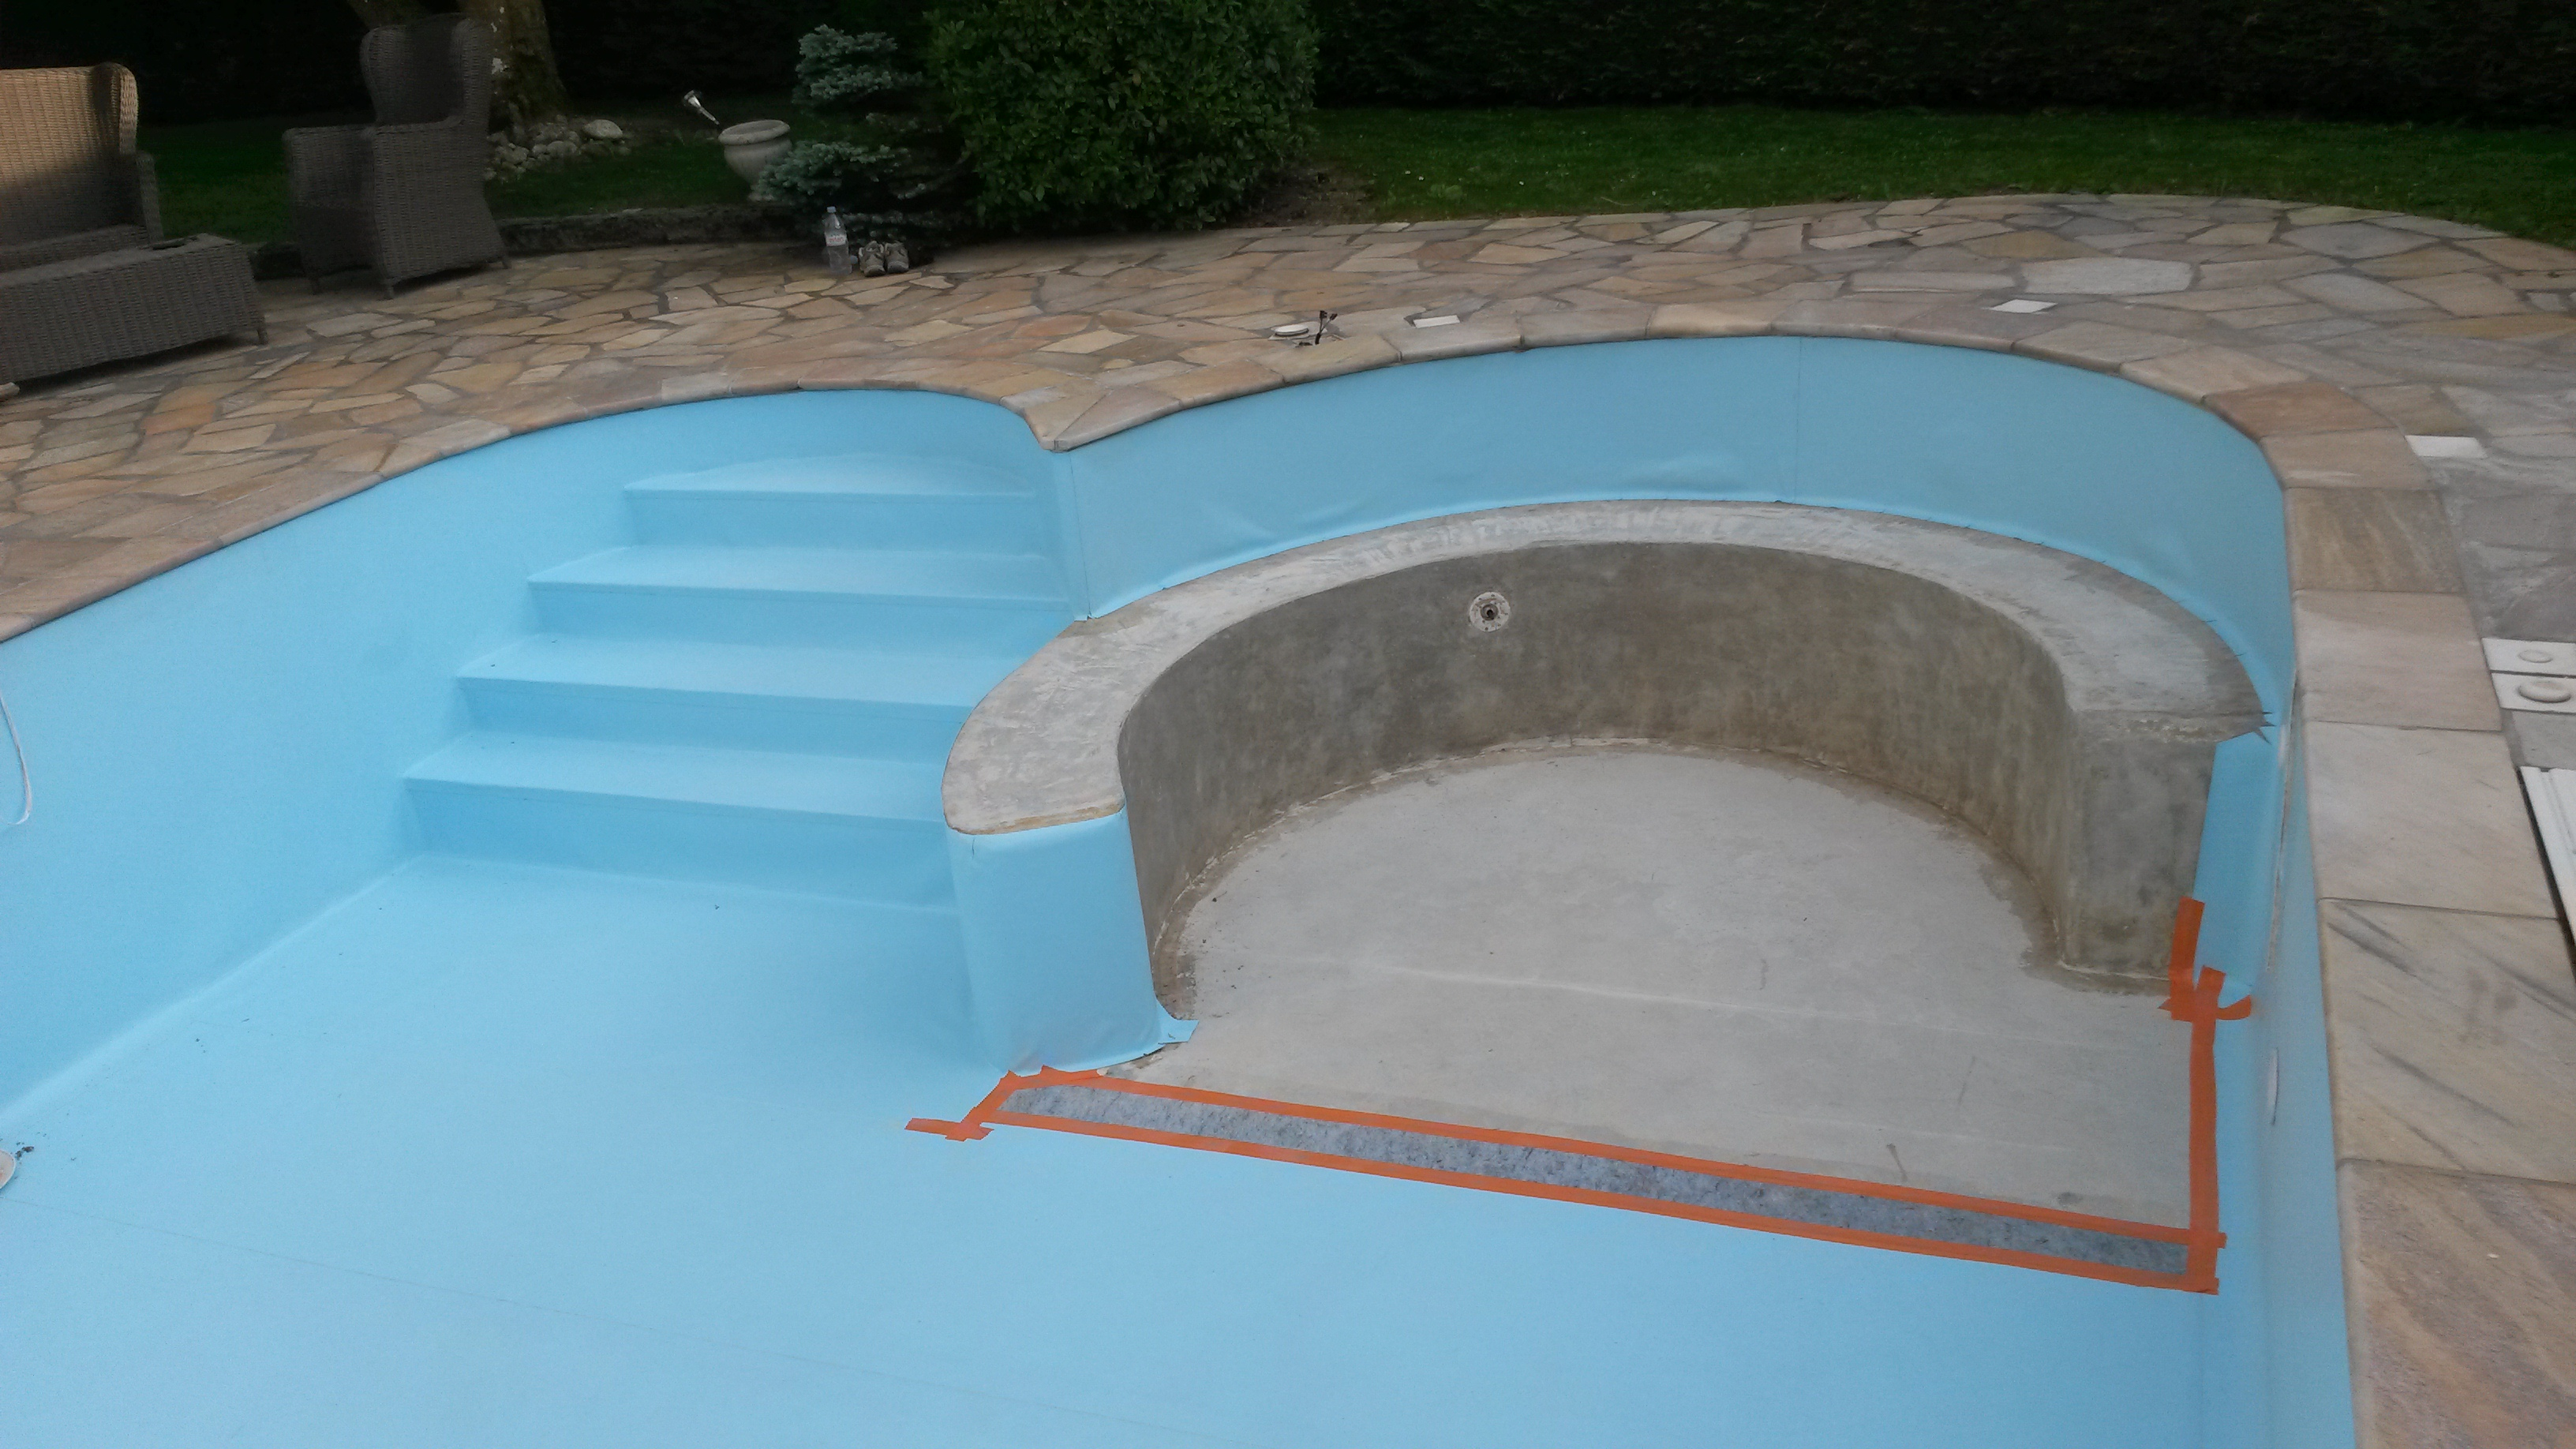 luxe liner pour piscine xwater piscine. Black Bedroom Furniture Sets. Home Design Ideas